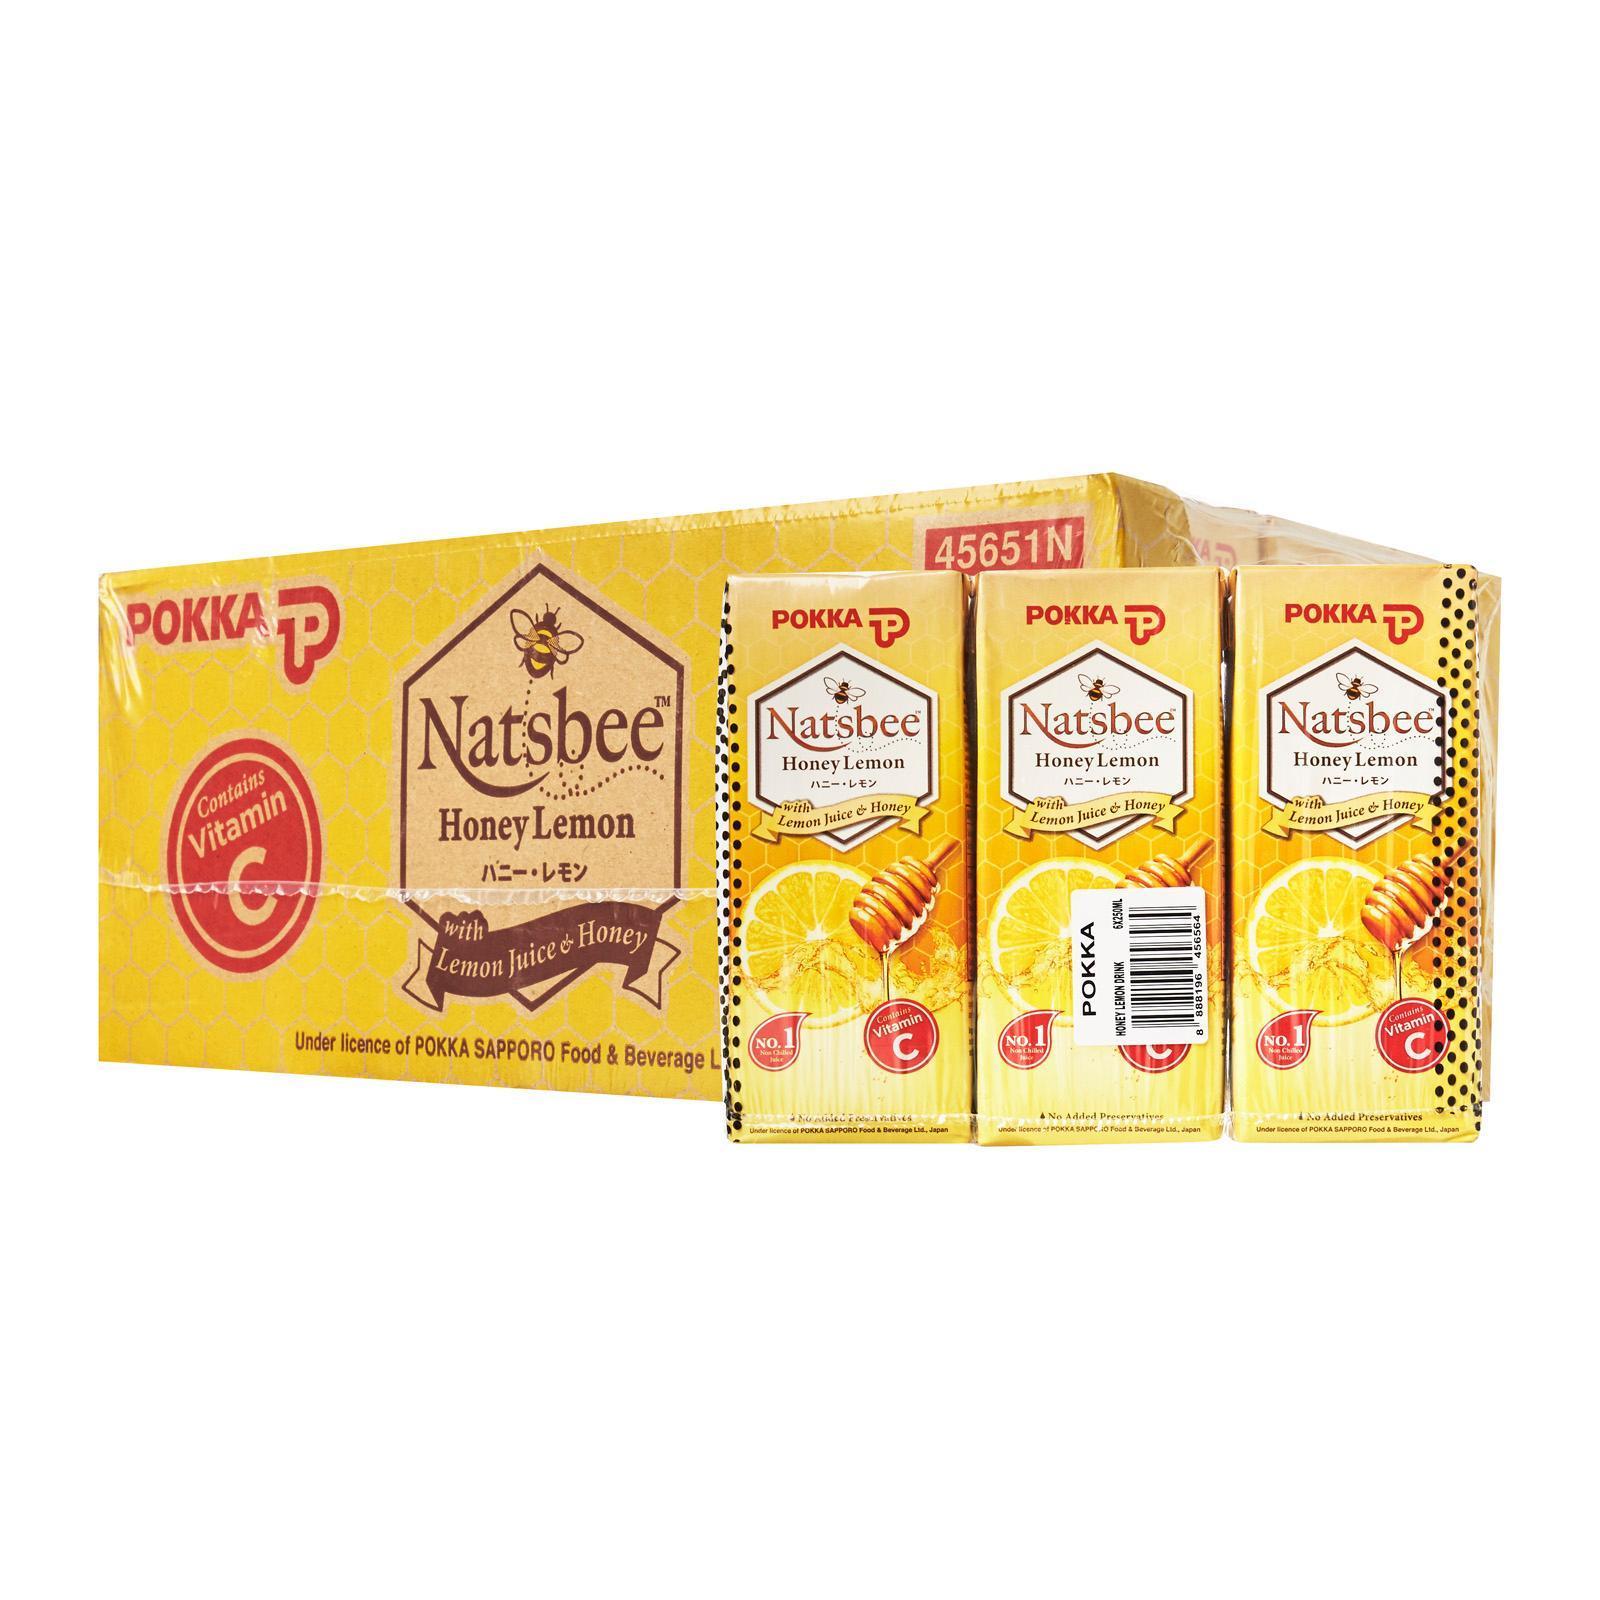 Pokka Natsbee Honey Lemon Juice Drink - Case